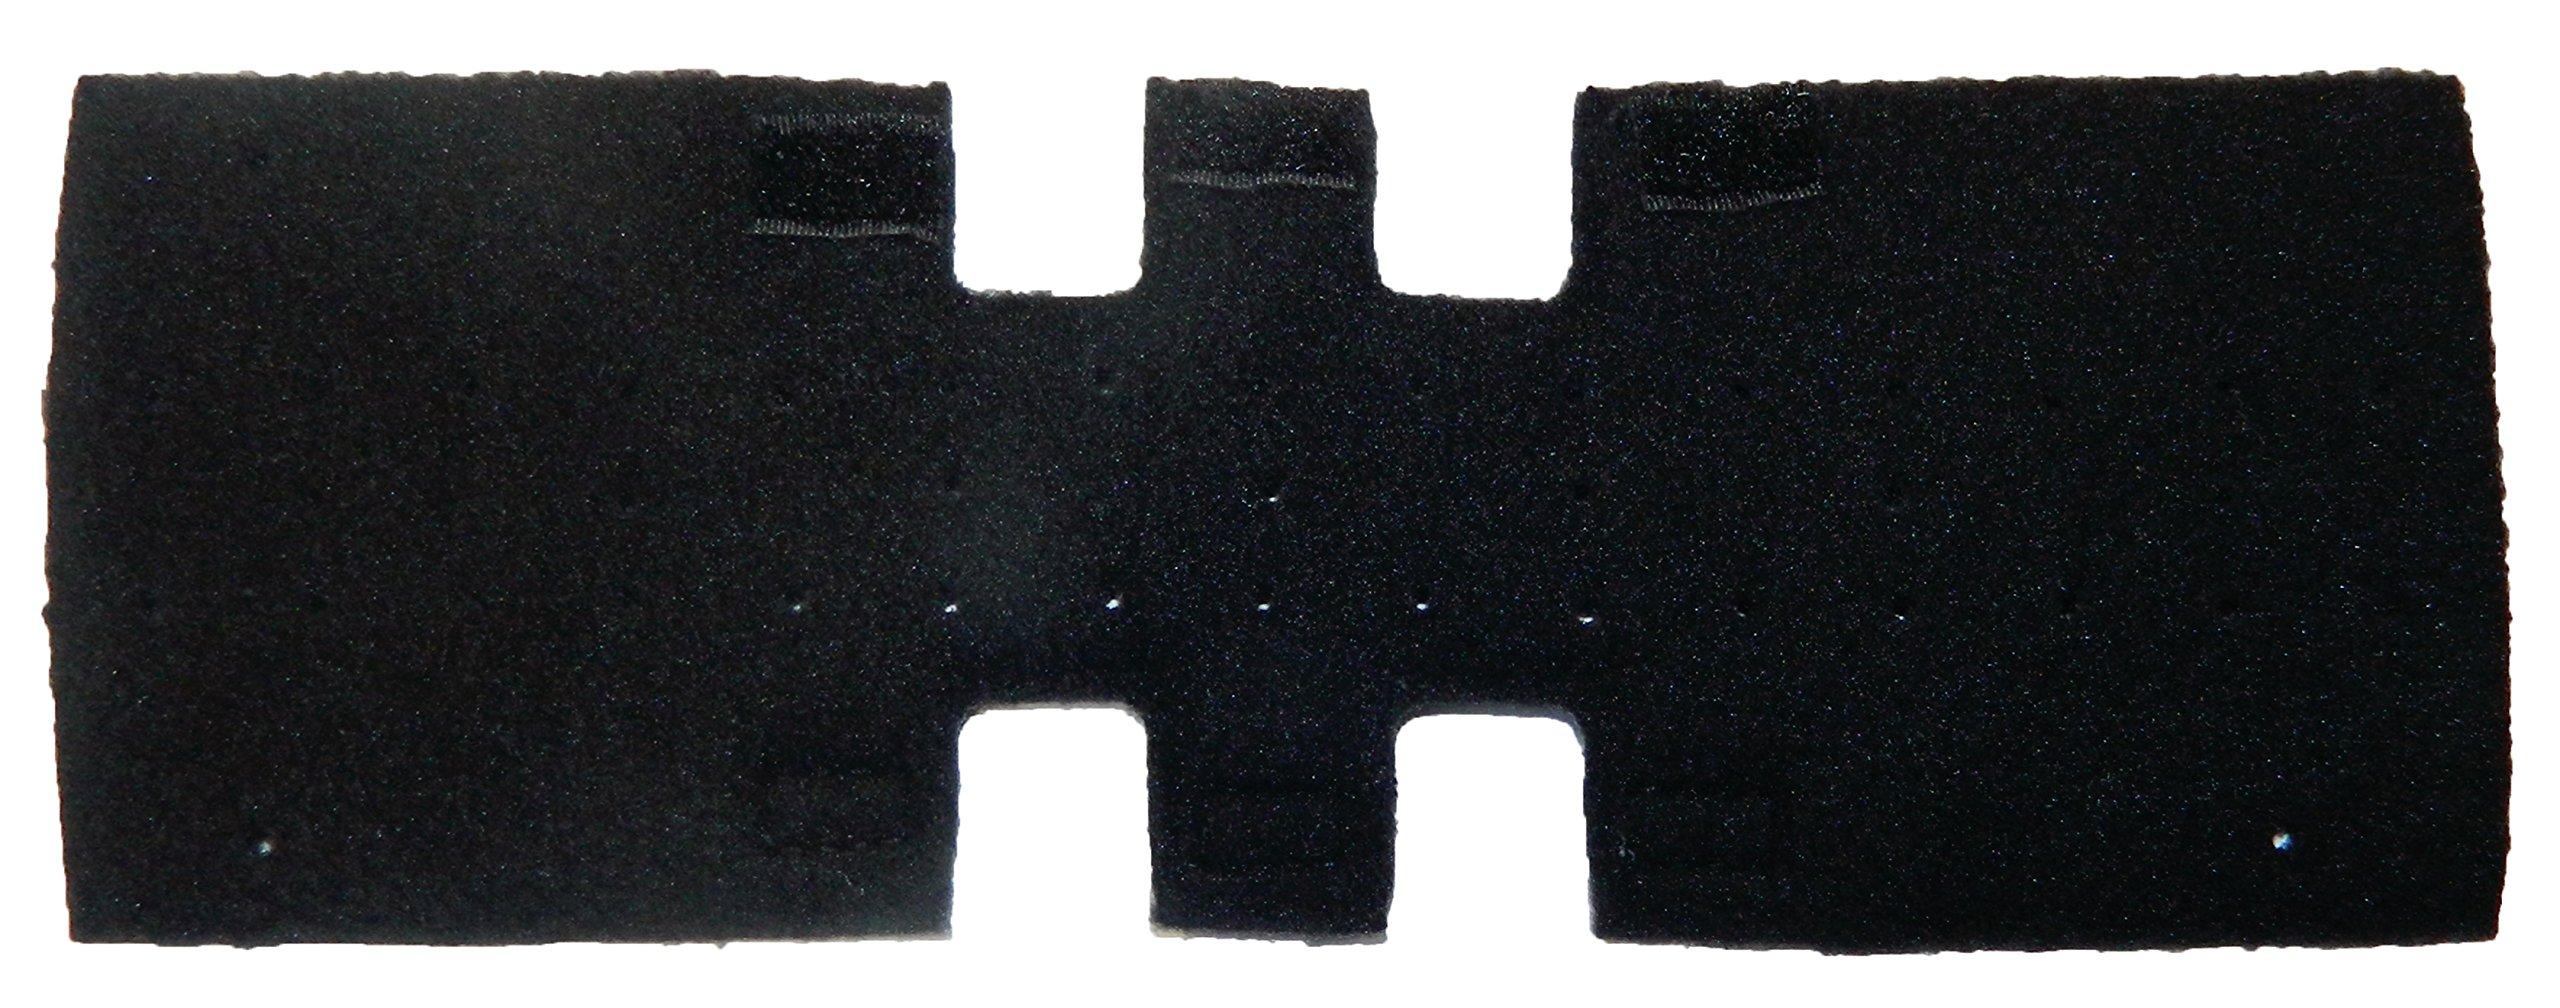 ArcOne AP-SWB-01 Sweatband for AirPlus Respiratory System